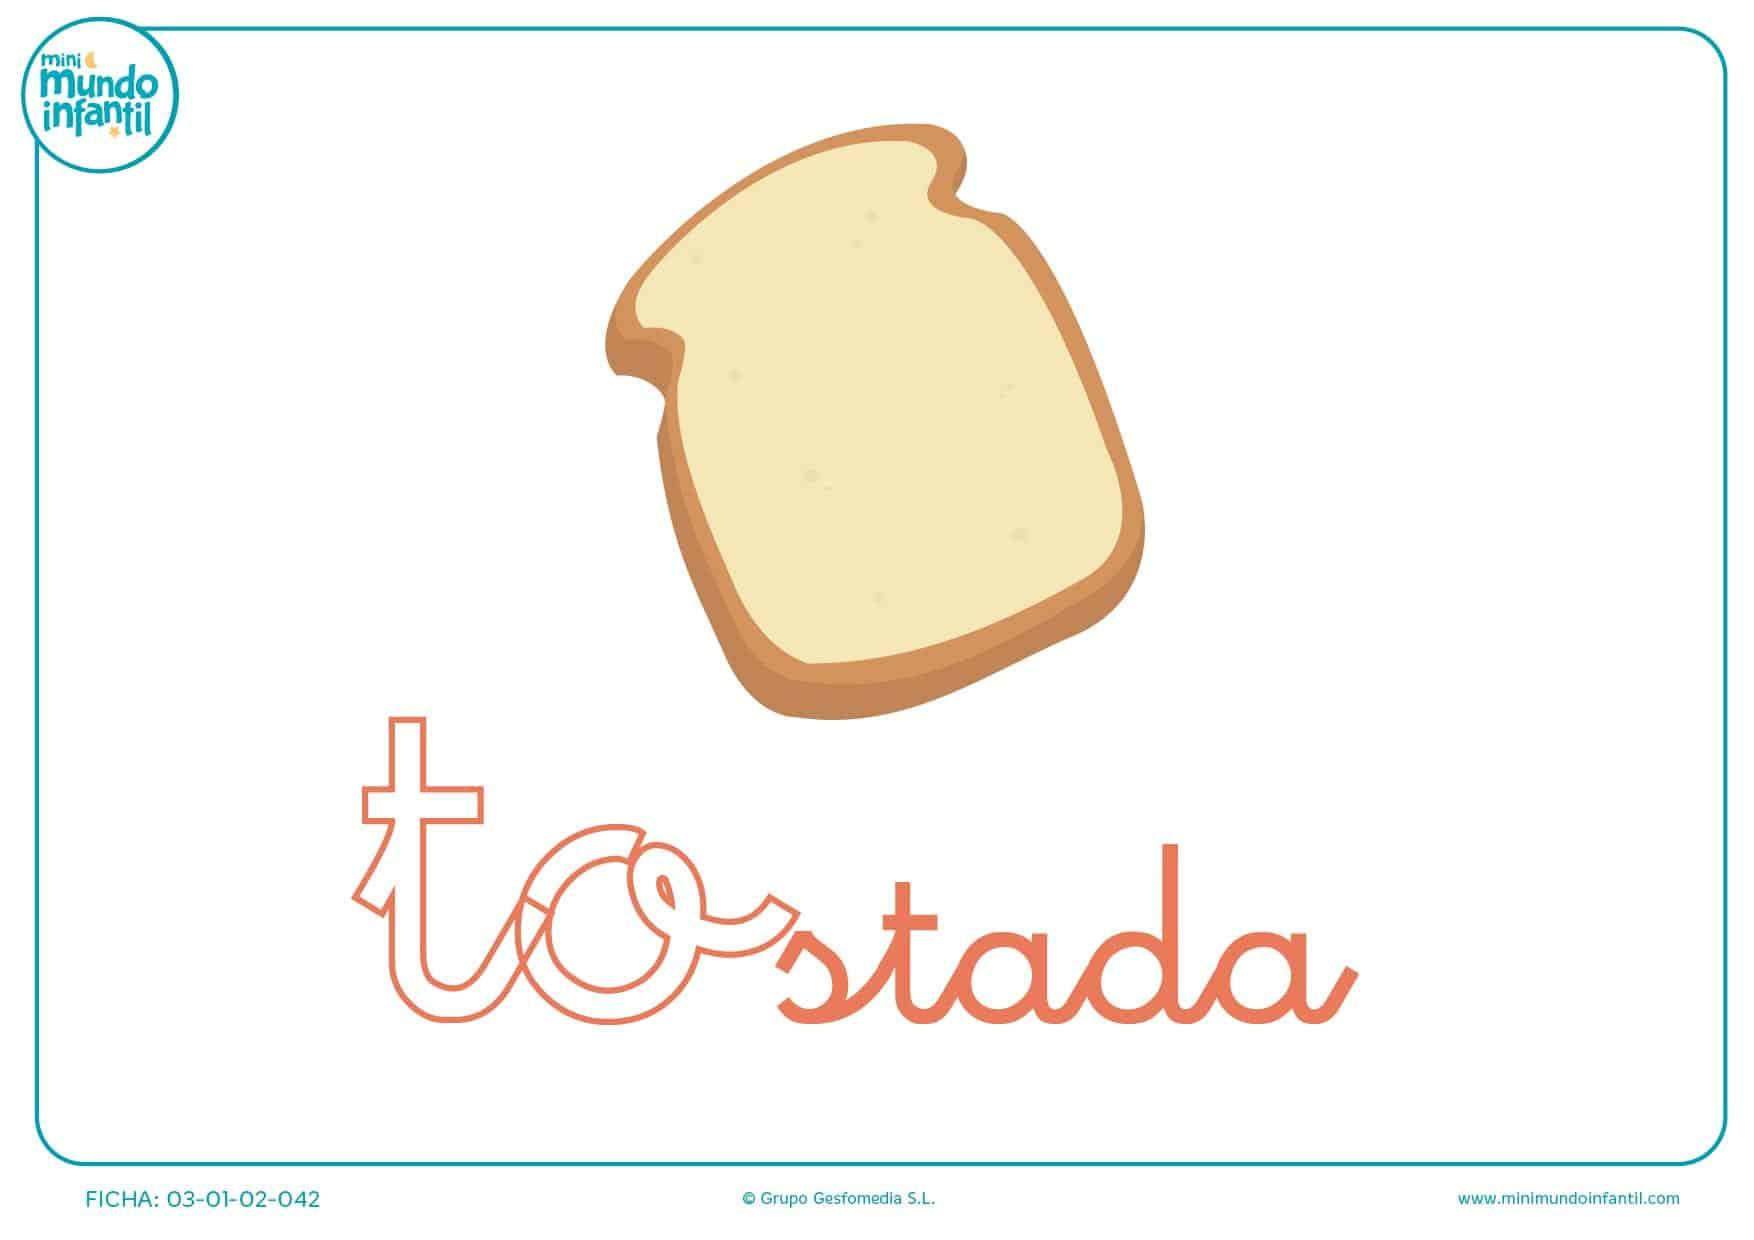 Sílaba TO minúscula de tostada para pintar